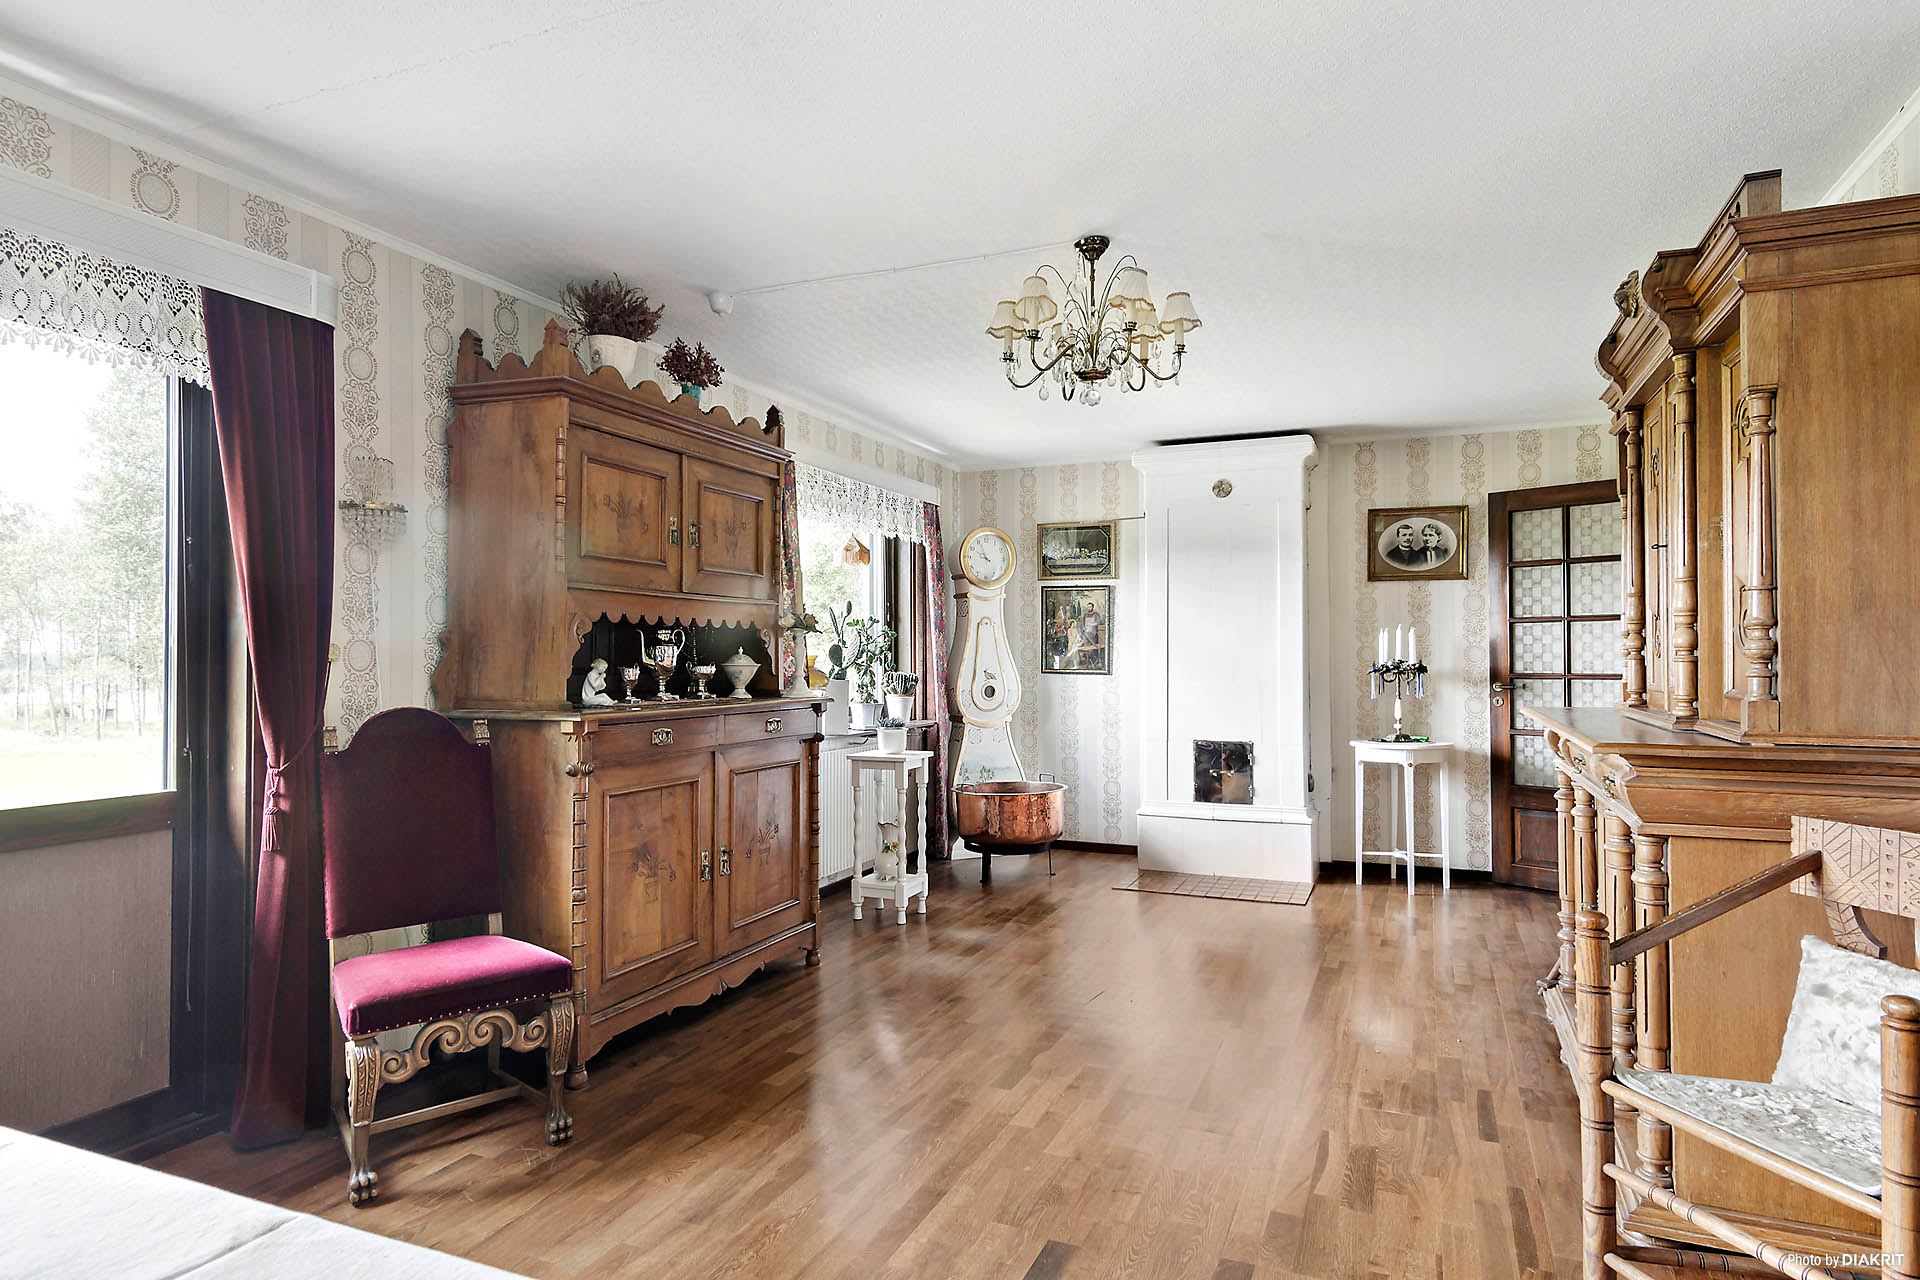 Ljus vardagsrum med fin kakelugn